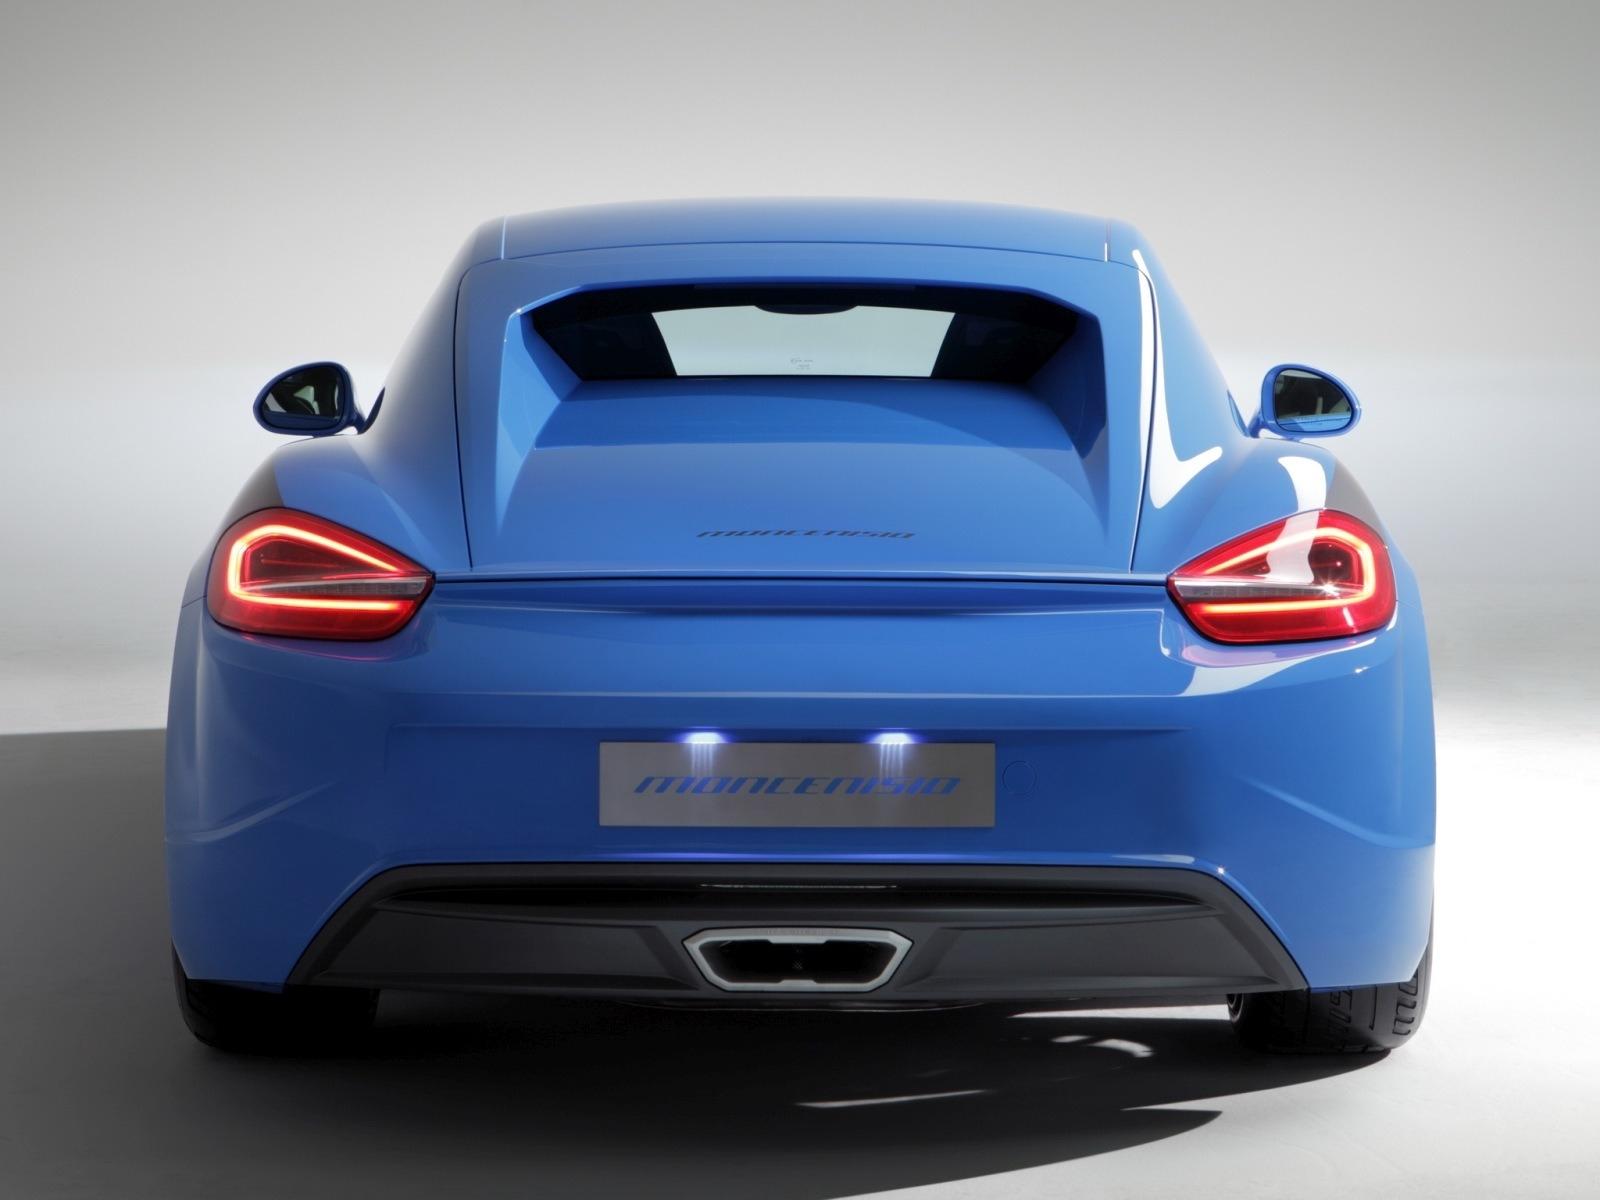 http://images.caradisiac.com/images/3/2/8/9/93289/S0-Studiotorino-Moncenisio-une-Porsche-Cayman-exclusive-317293.jpg